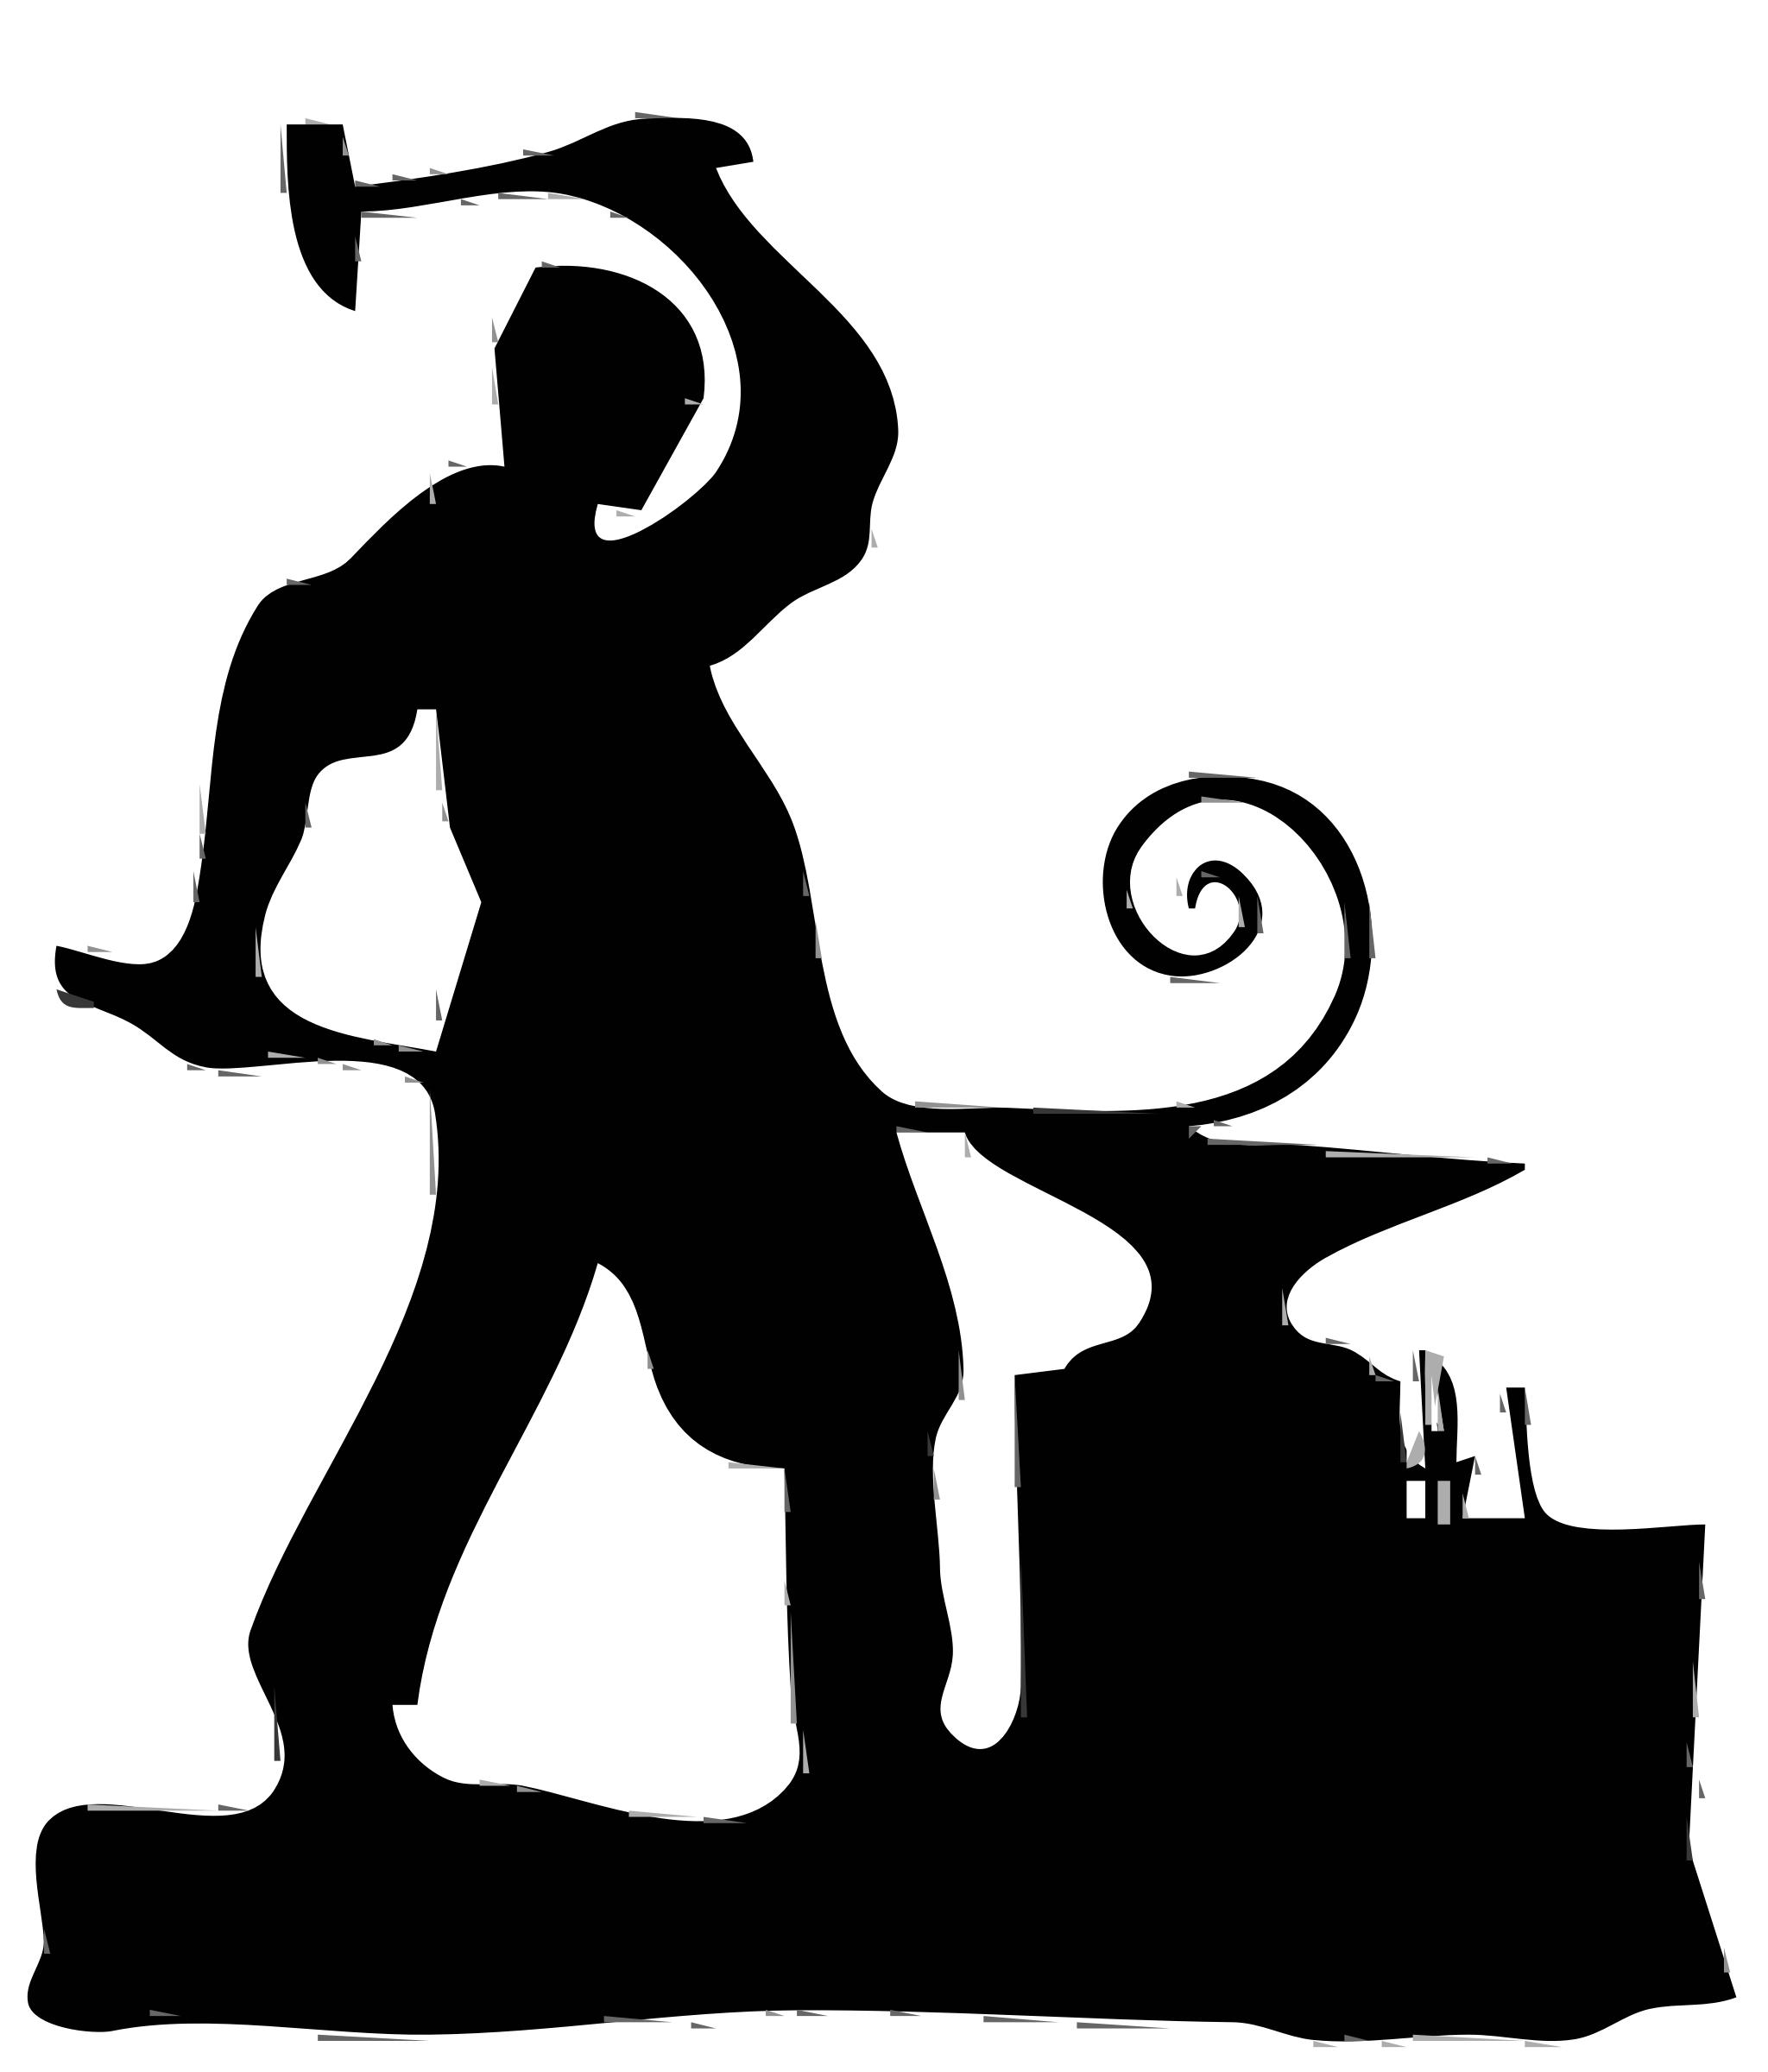 Blacksmith svg #18, Download drawings